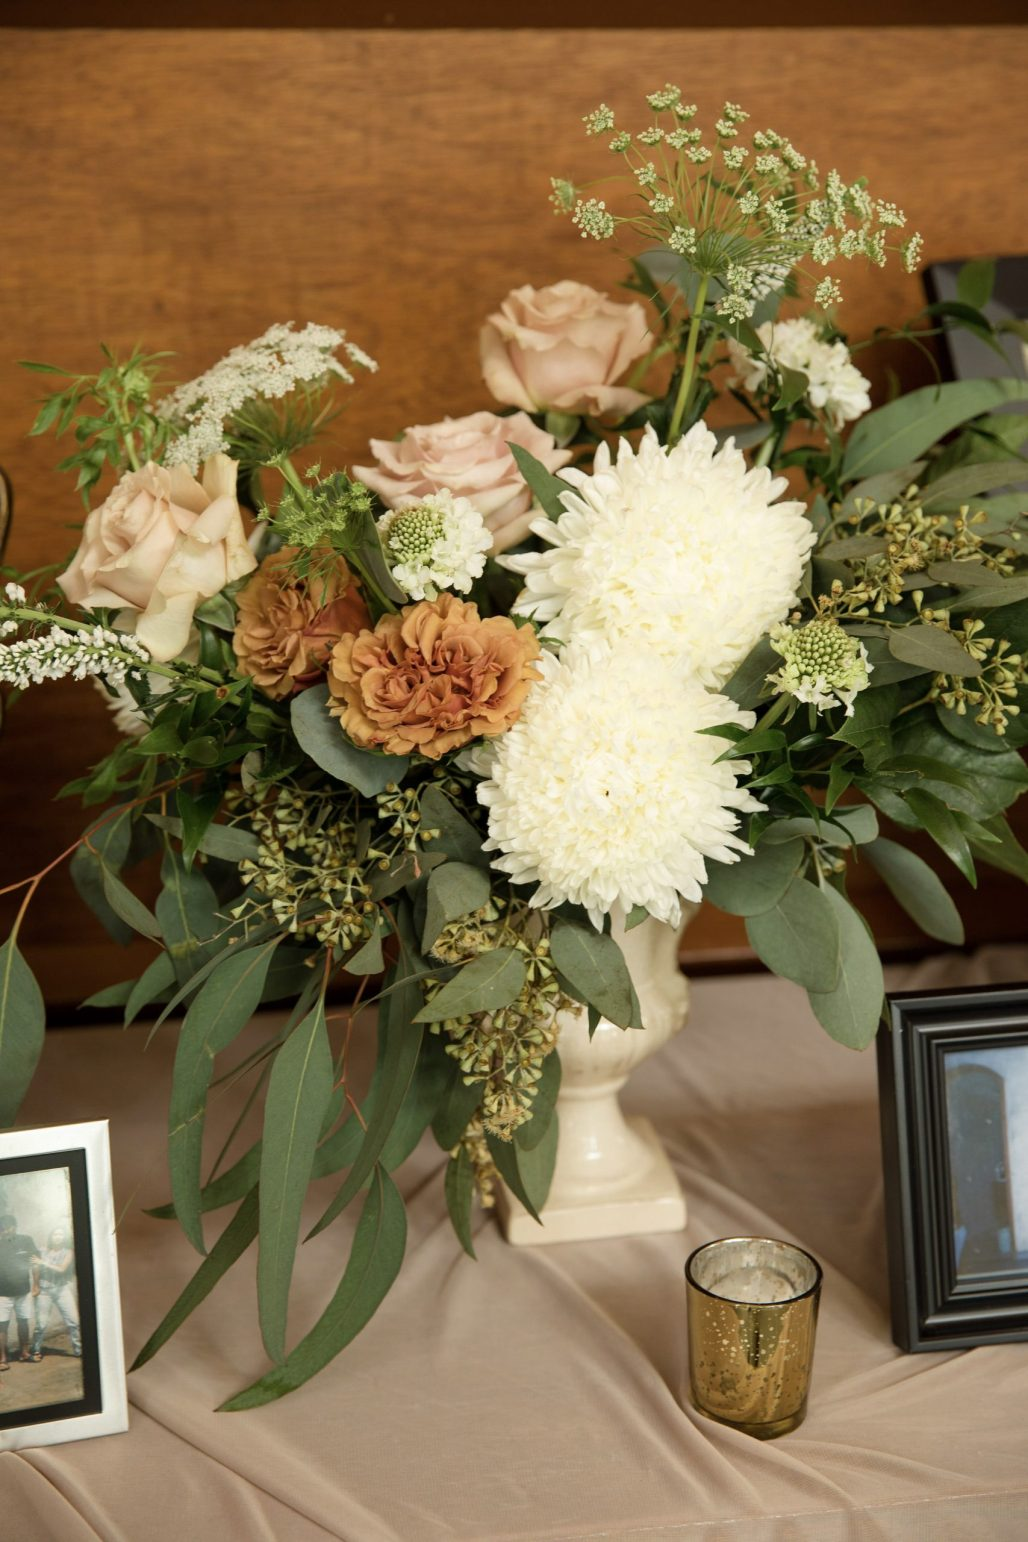 Thainara + Jose's Boho French Wedding Inspired by Soft Terracotta Hues || Dreamery Events